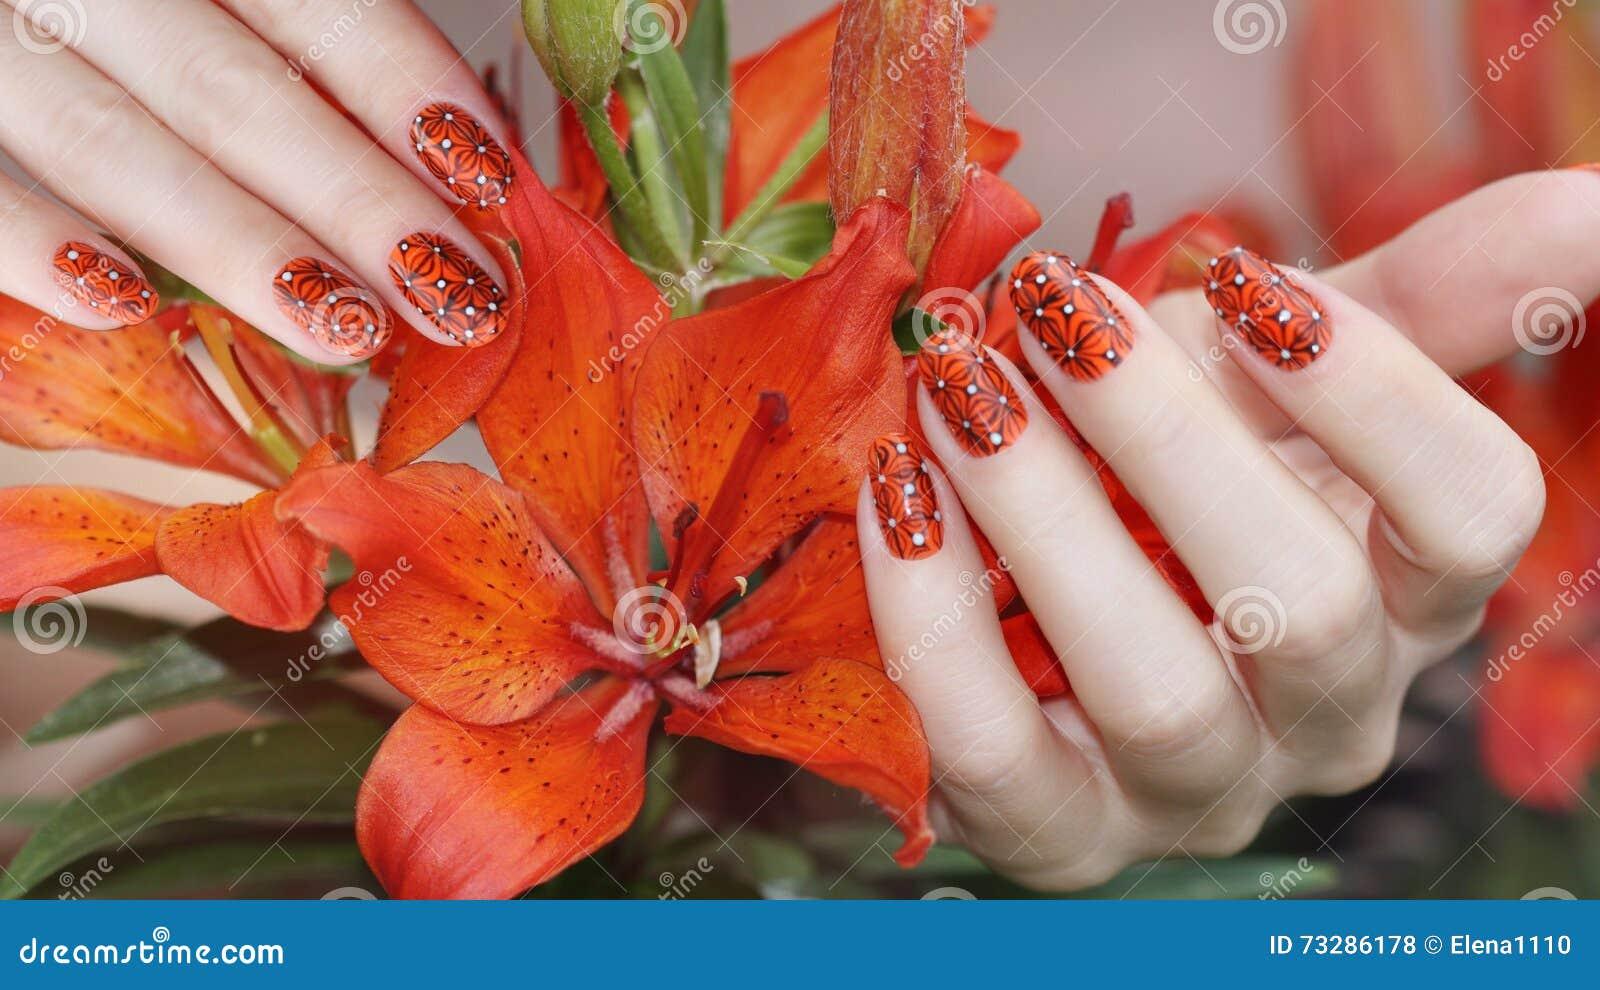 Lilys Nail Art Design